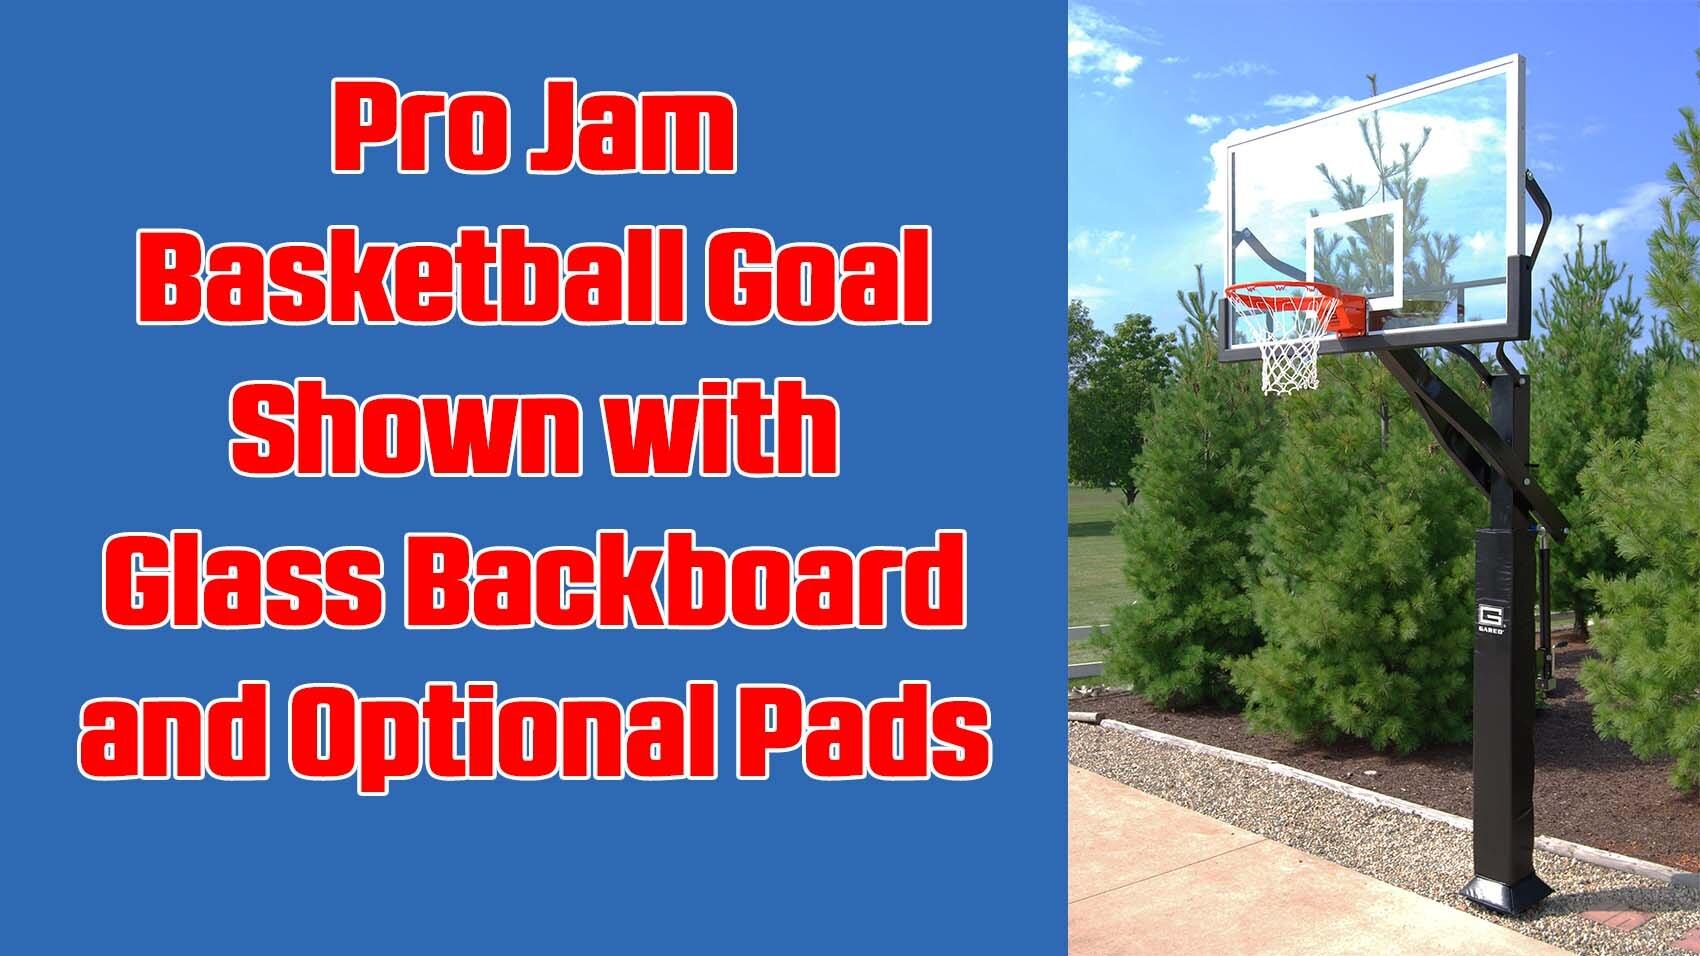 Collegiate Pro Jam Basketball System with Glass Backboard